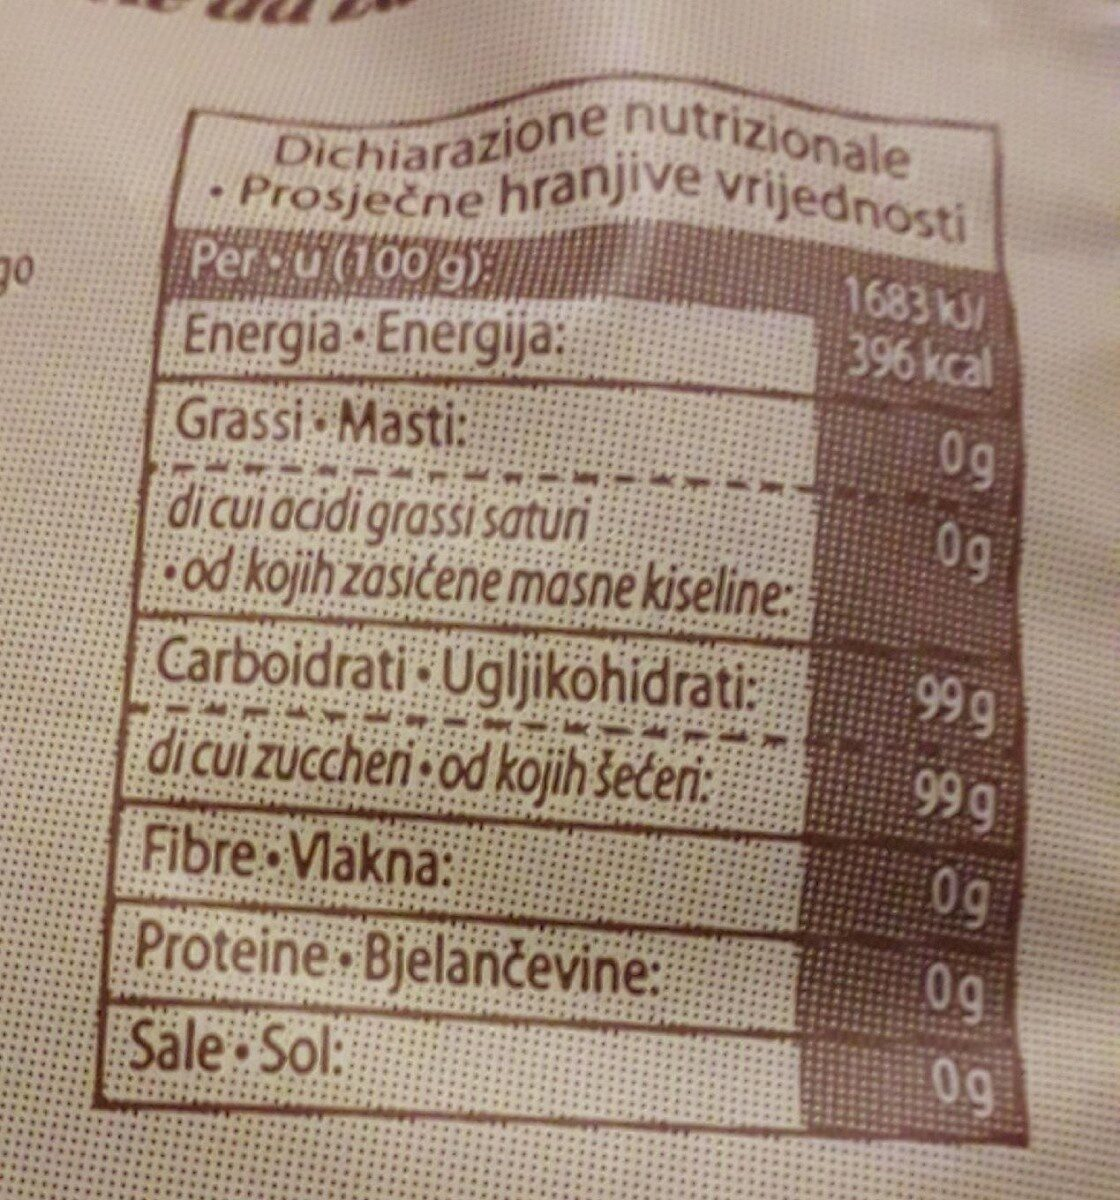 Zucchero grezzo di canna - Voedingswaarden - it